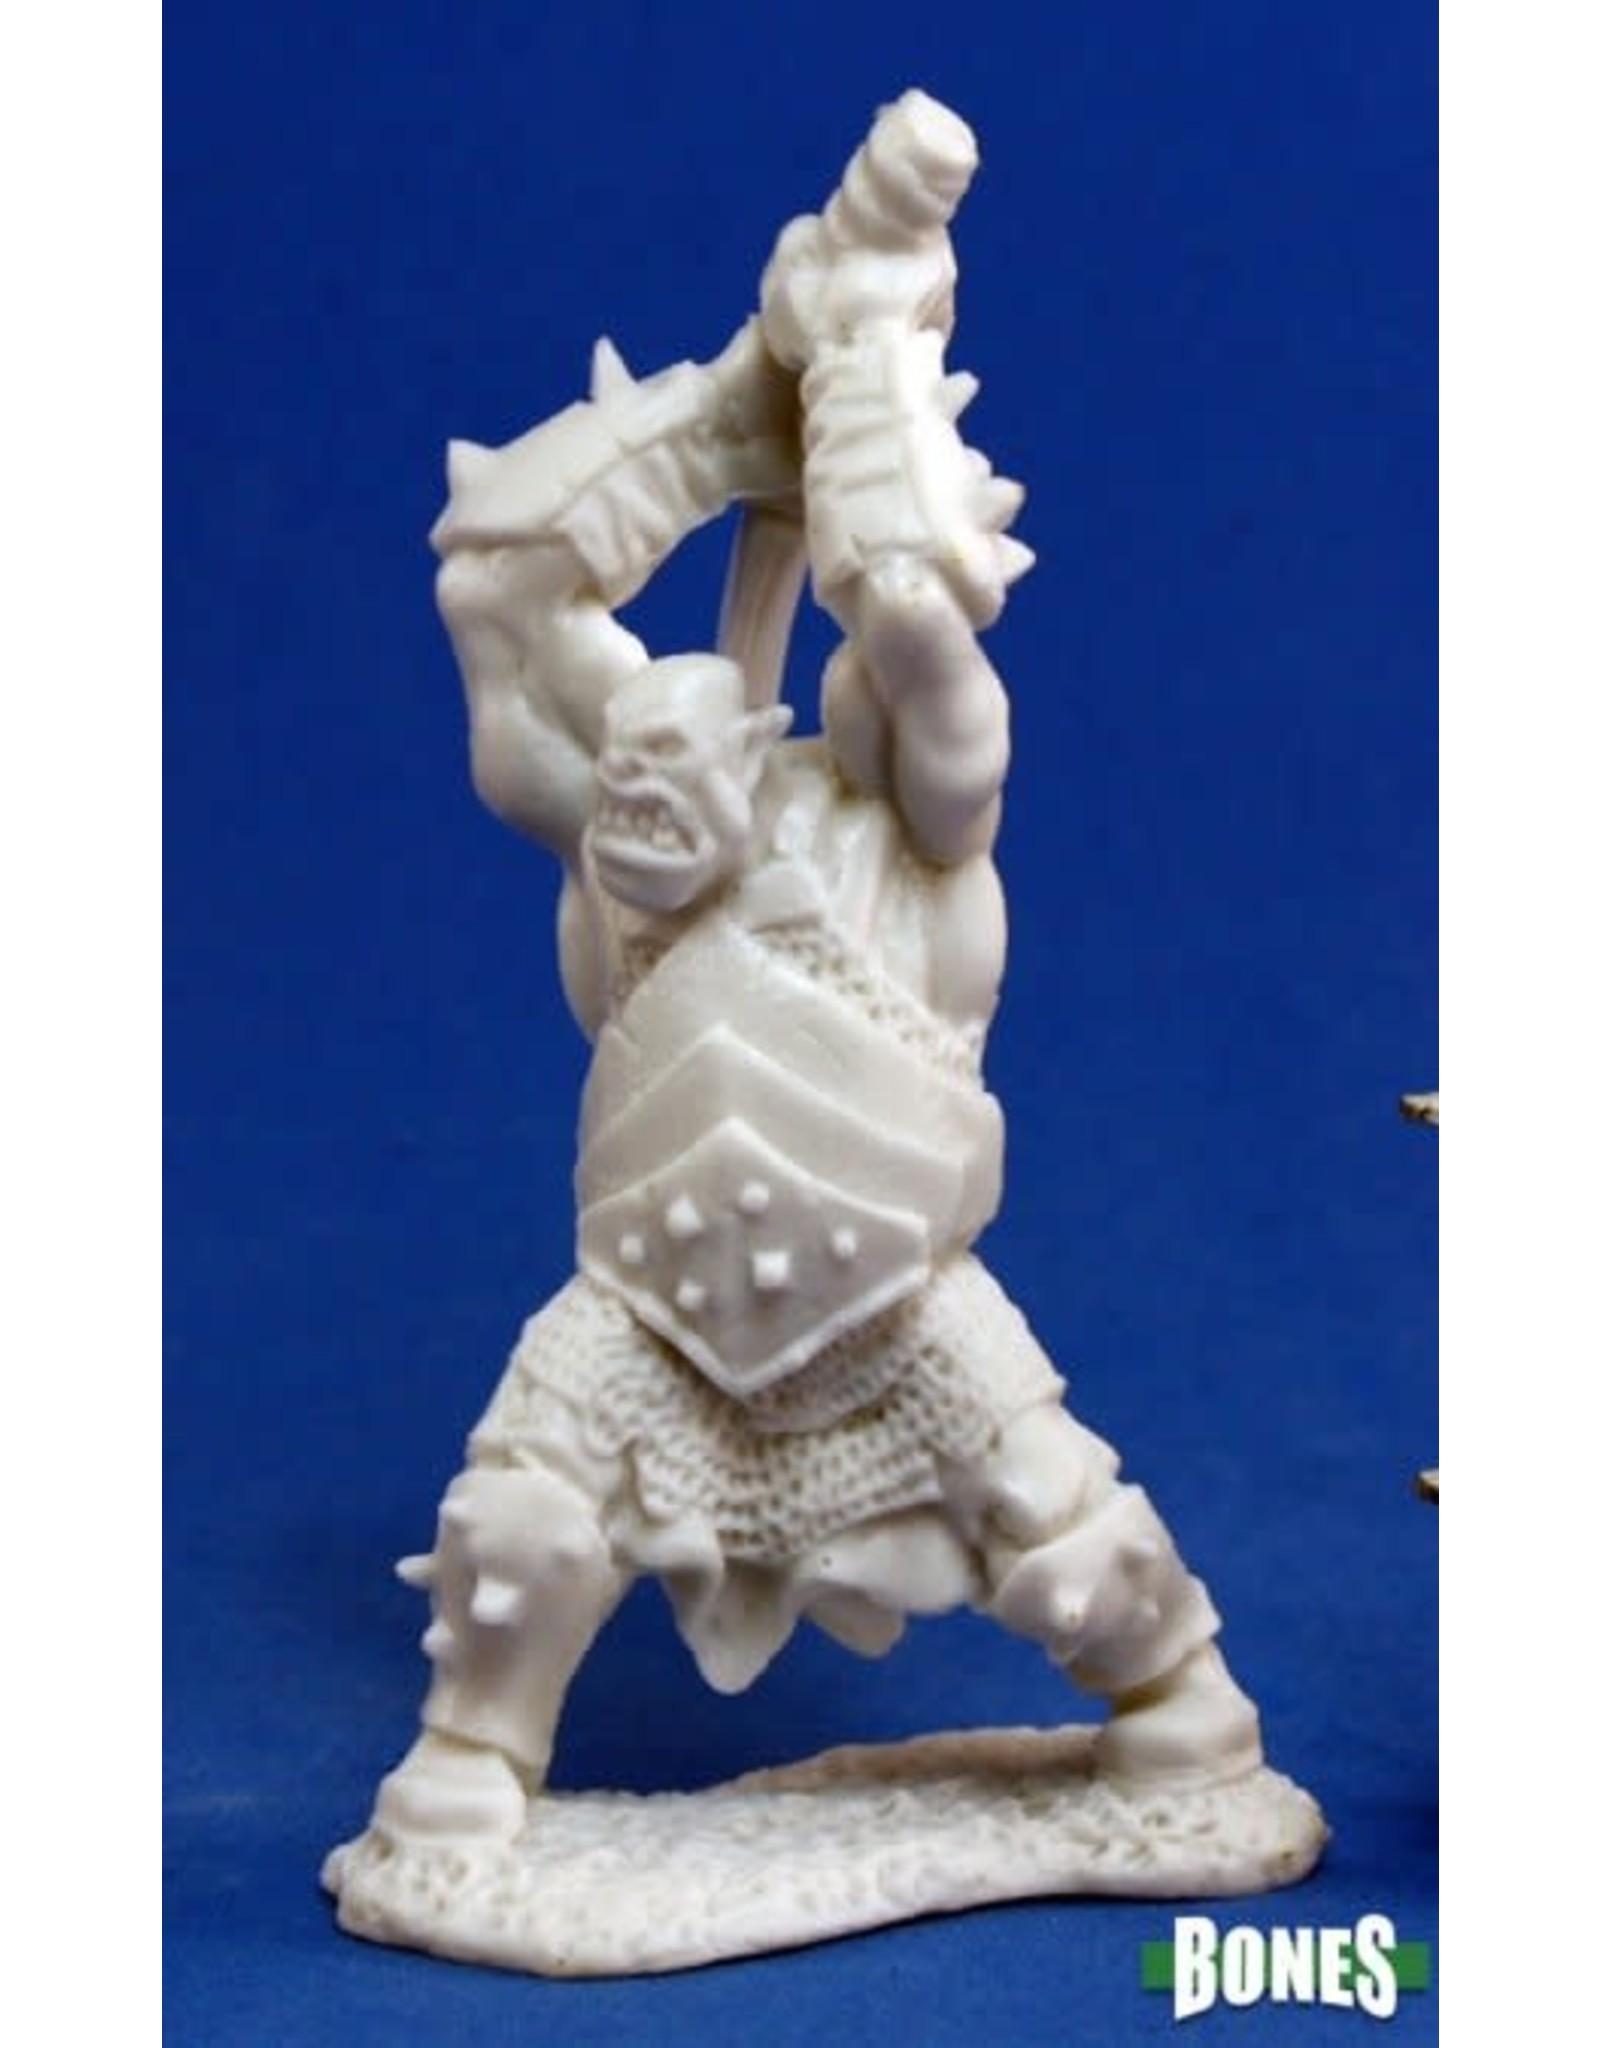 Reaper Miniatures Bones: Orc Berserker (Greatsword)